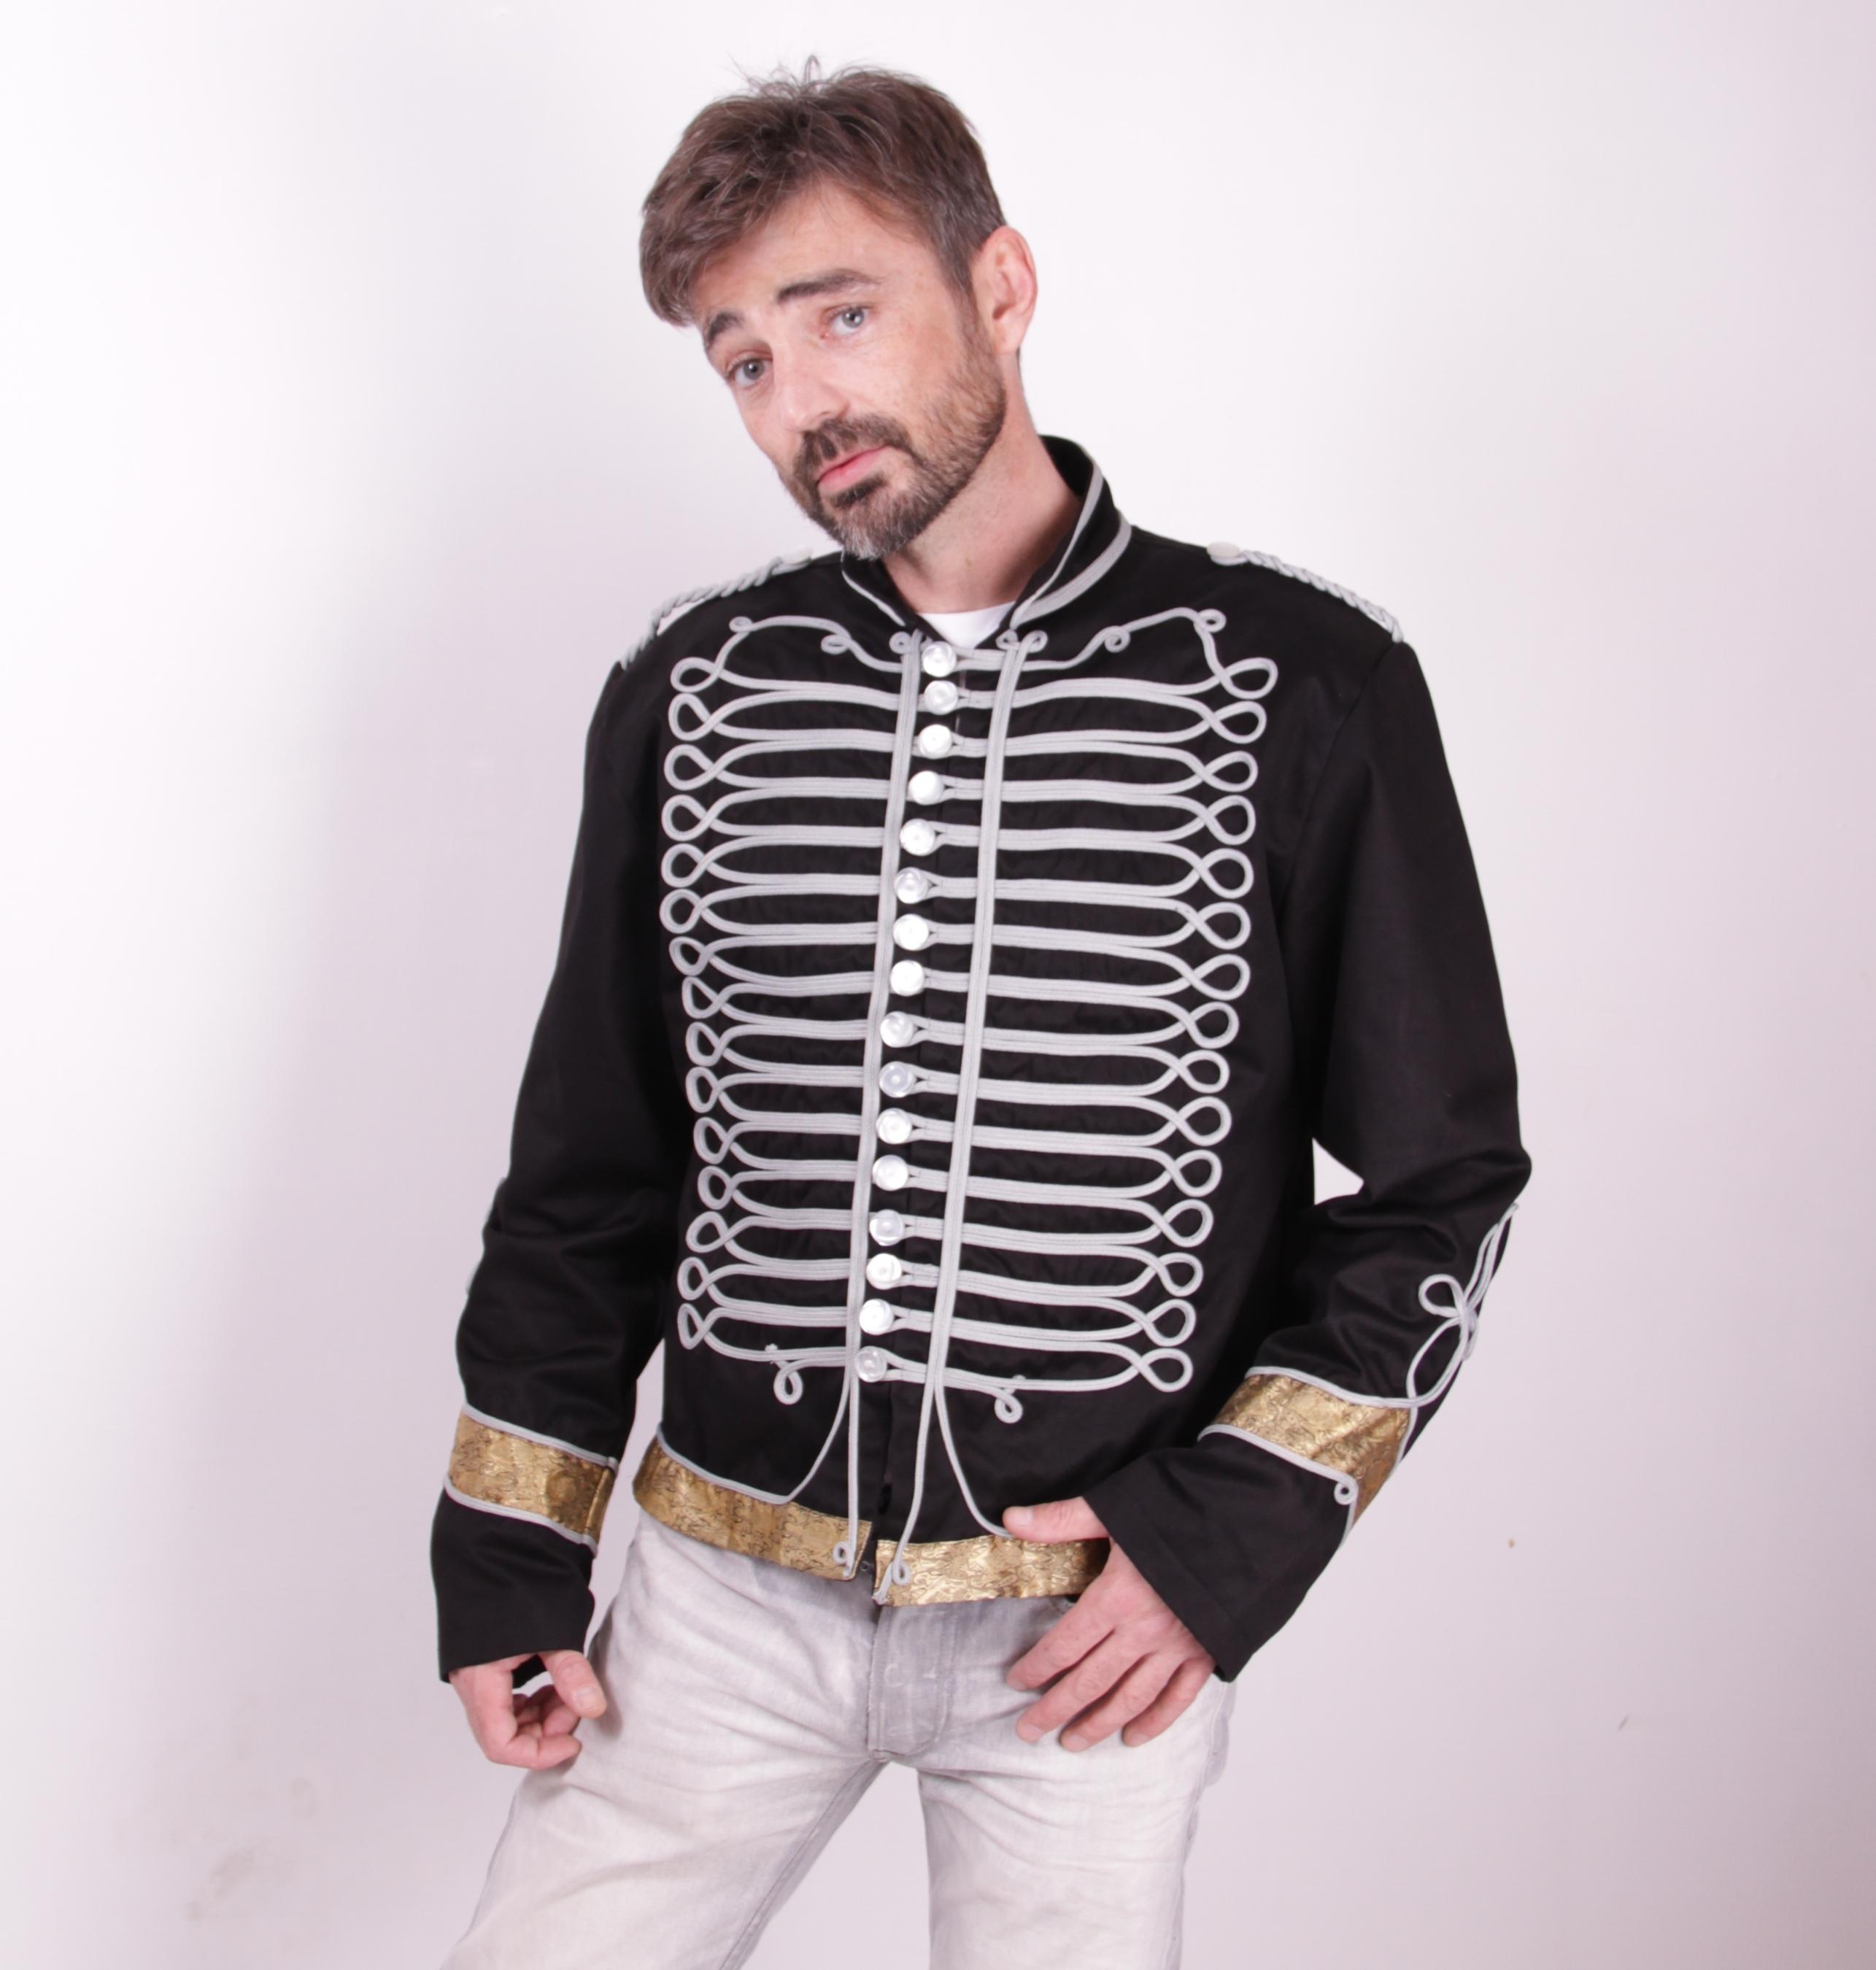 hedj_military_style_jacket_lady_ks_black_jackets_and_outerwear_2.JPG